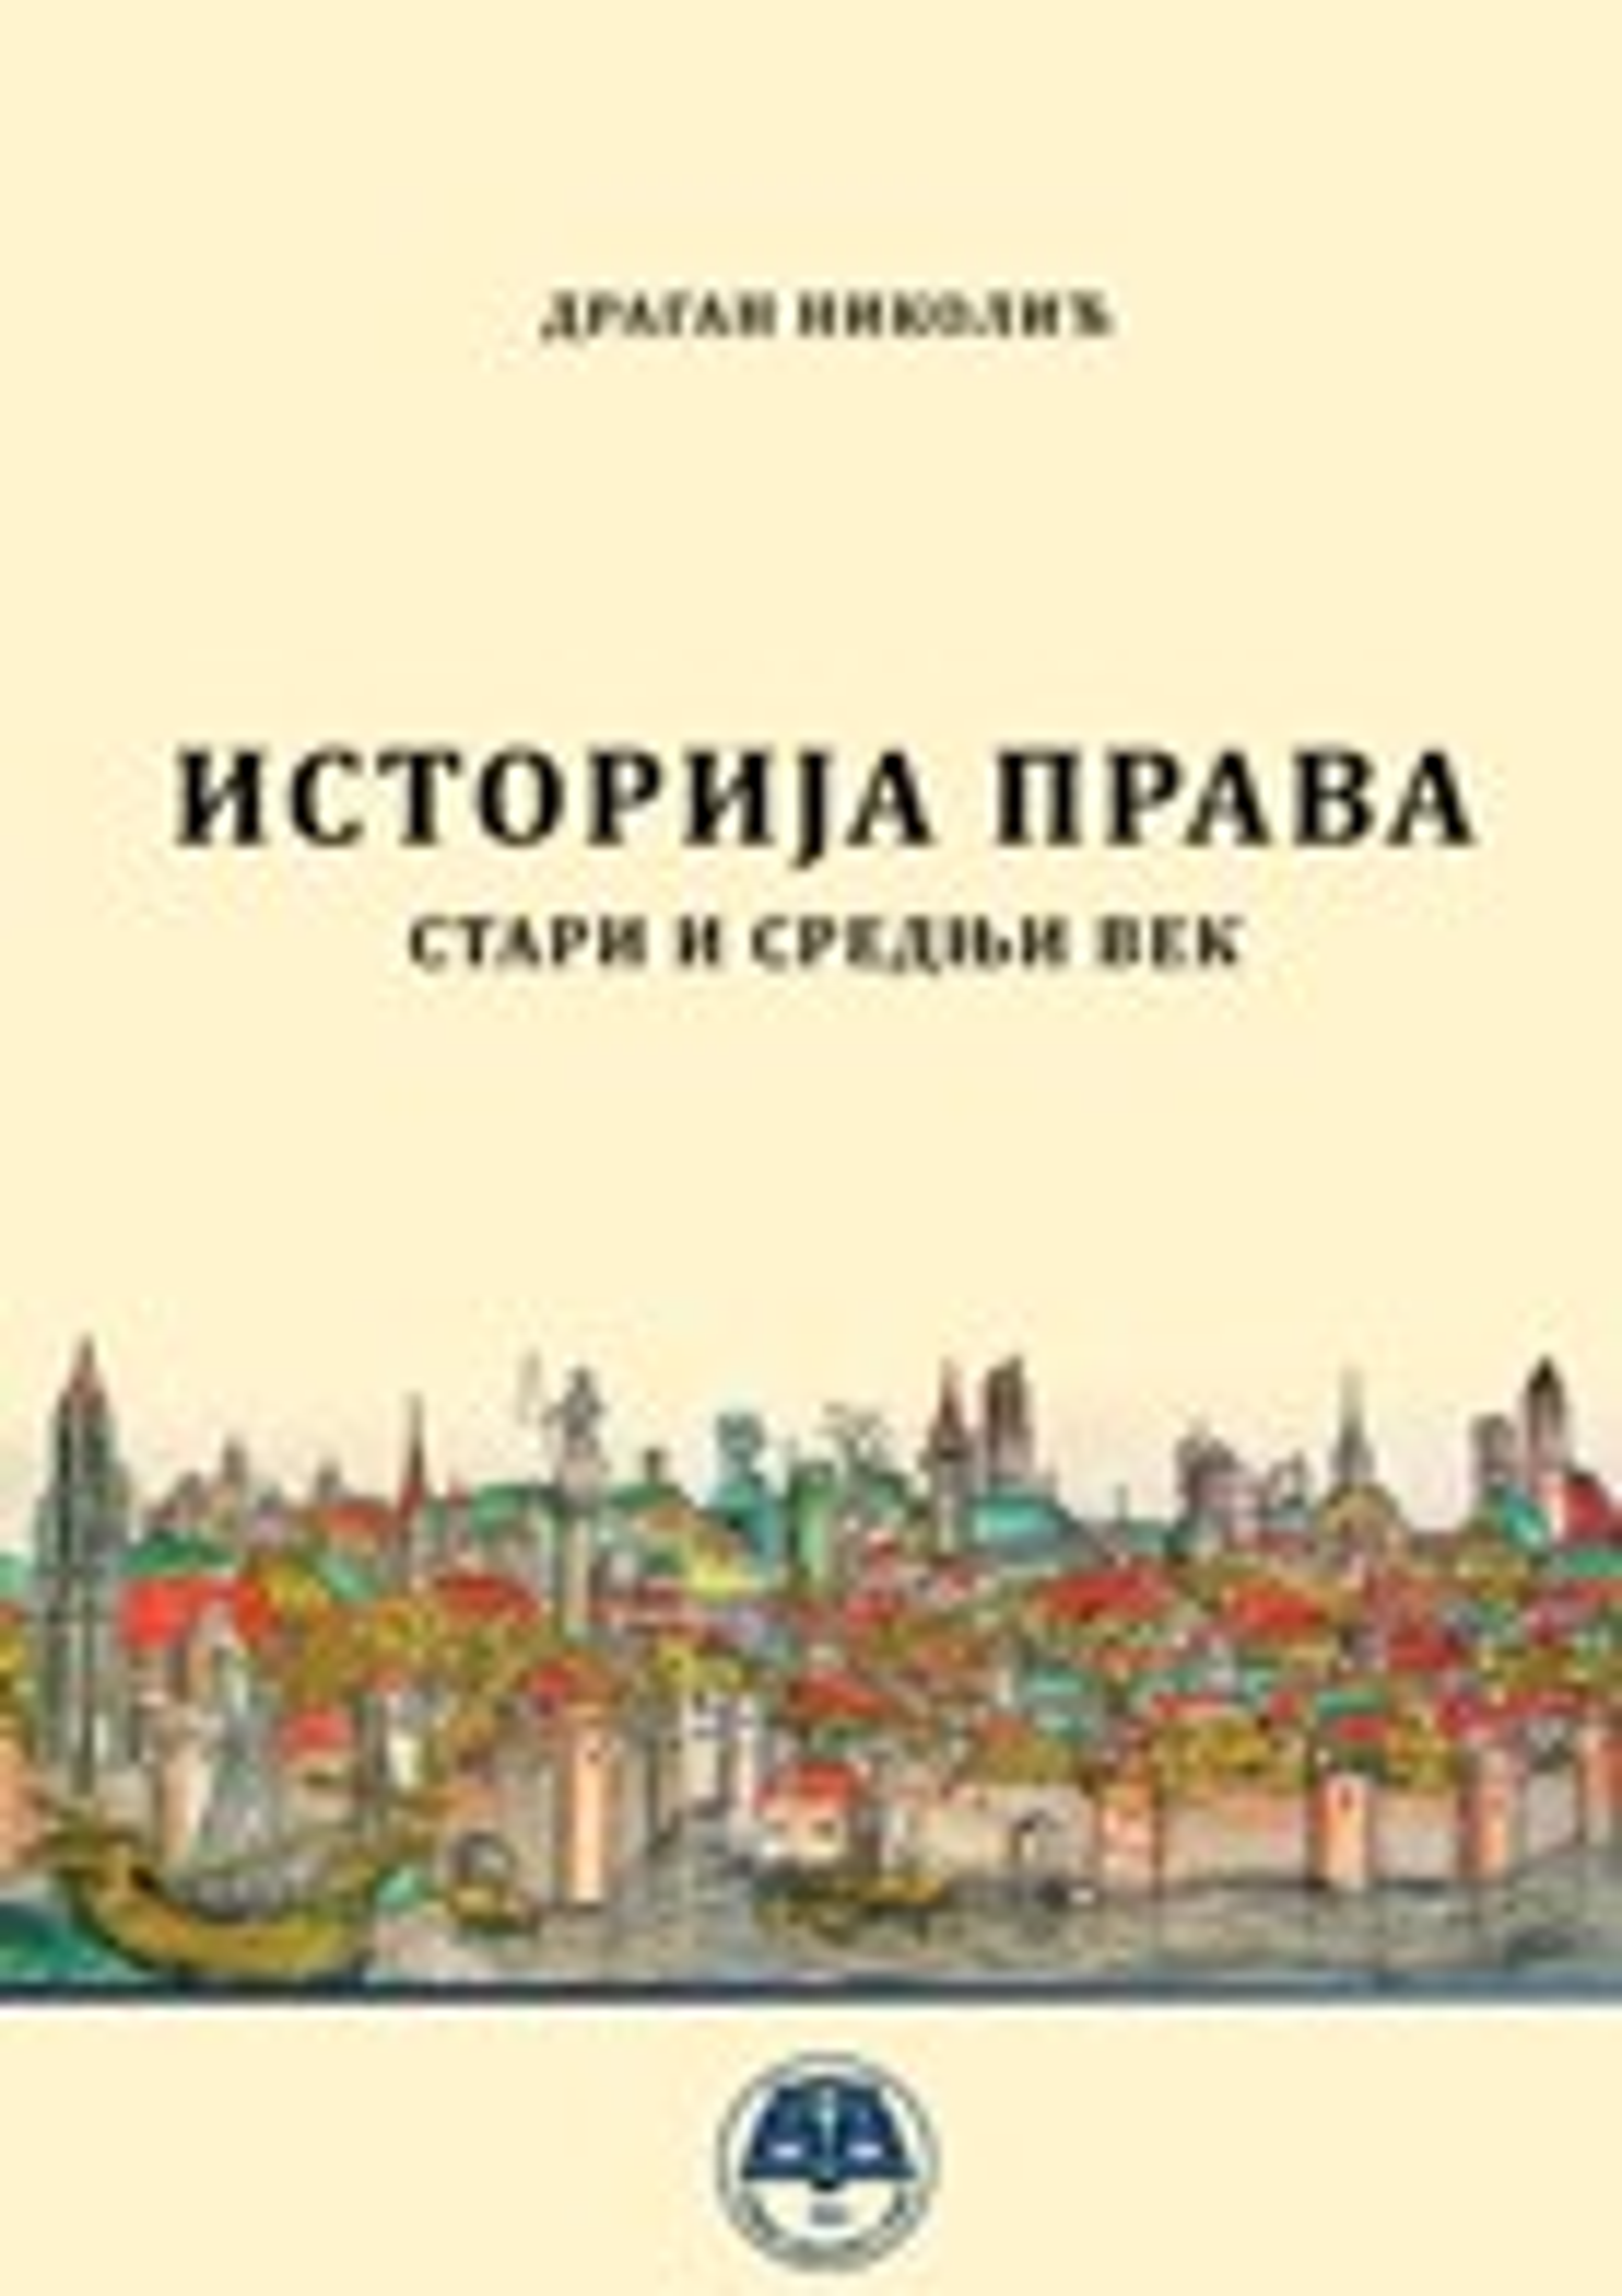 Istorija prava - stari i srednji vek